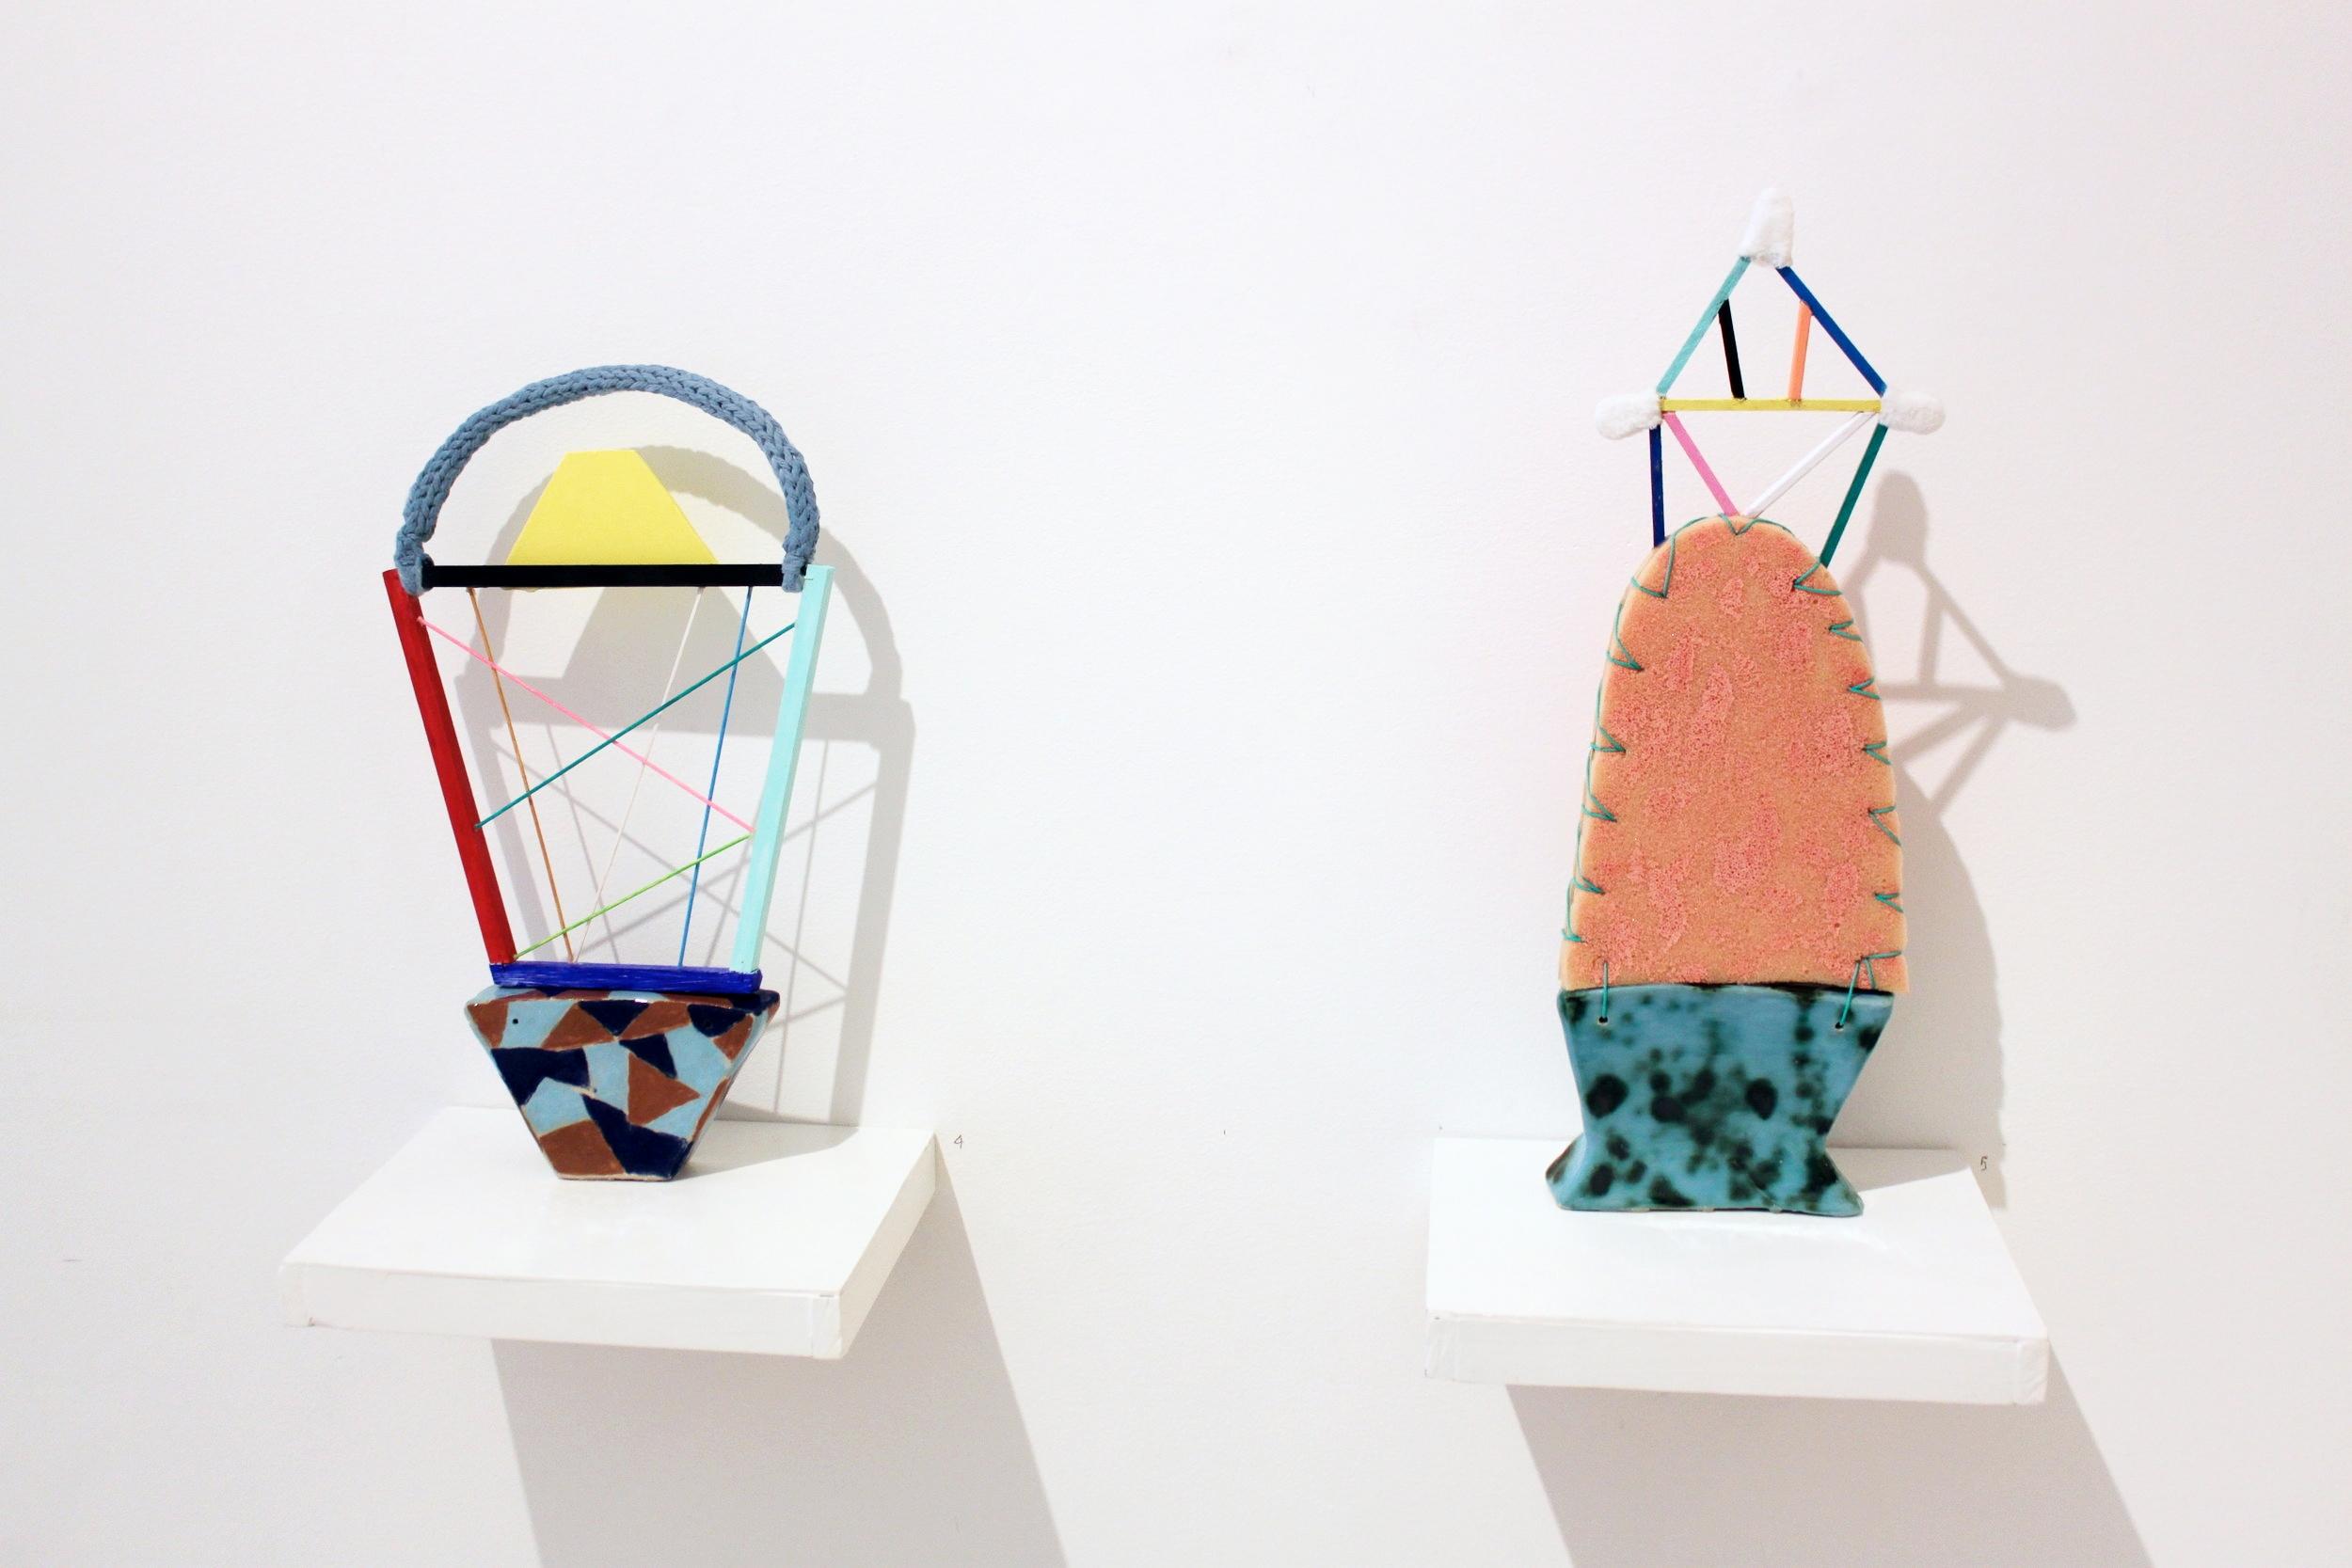 """Inner connections"" Ceramics, wood, yarn, wire. 46 x 26 x6 cm. 2016 ""Original"" Ceramics, wood, foam, mason cord, textile. 54 x 19 x 6 cm. 2016.""Originals"" Galerie Pi. 2016"